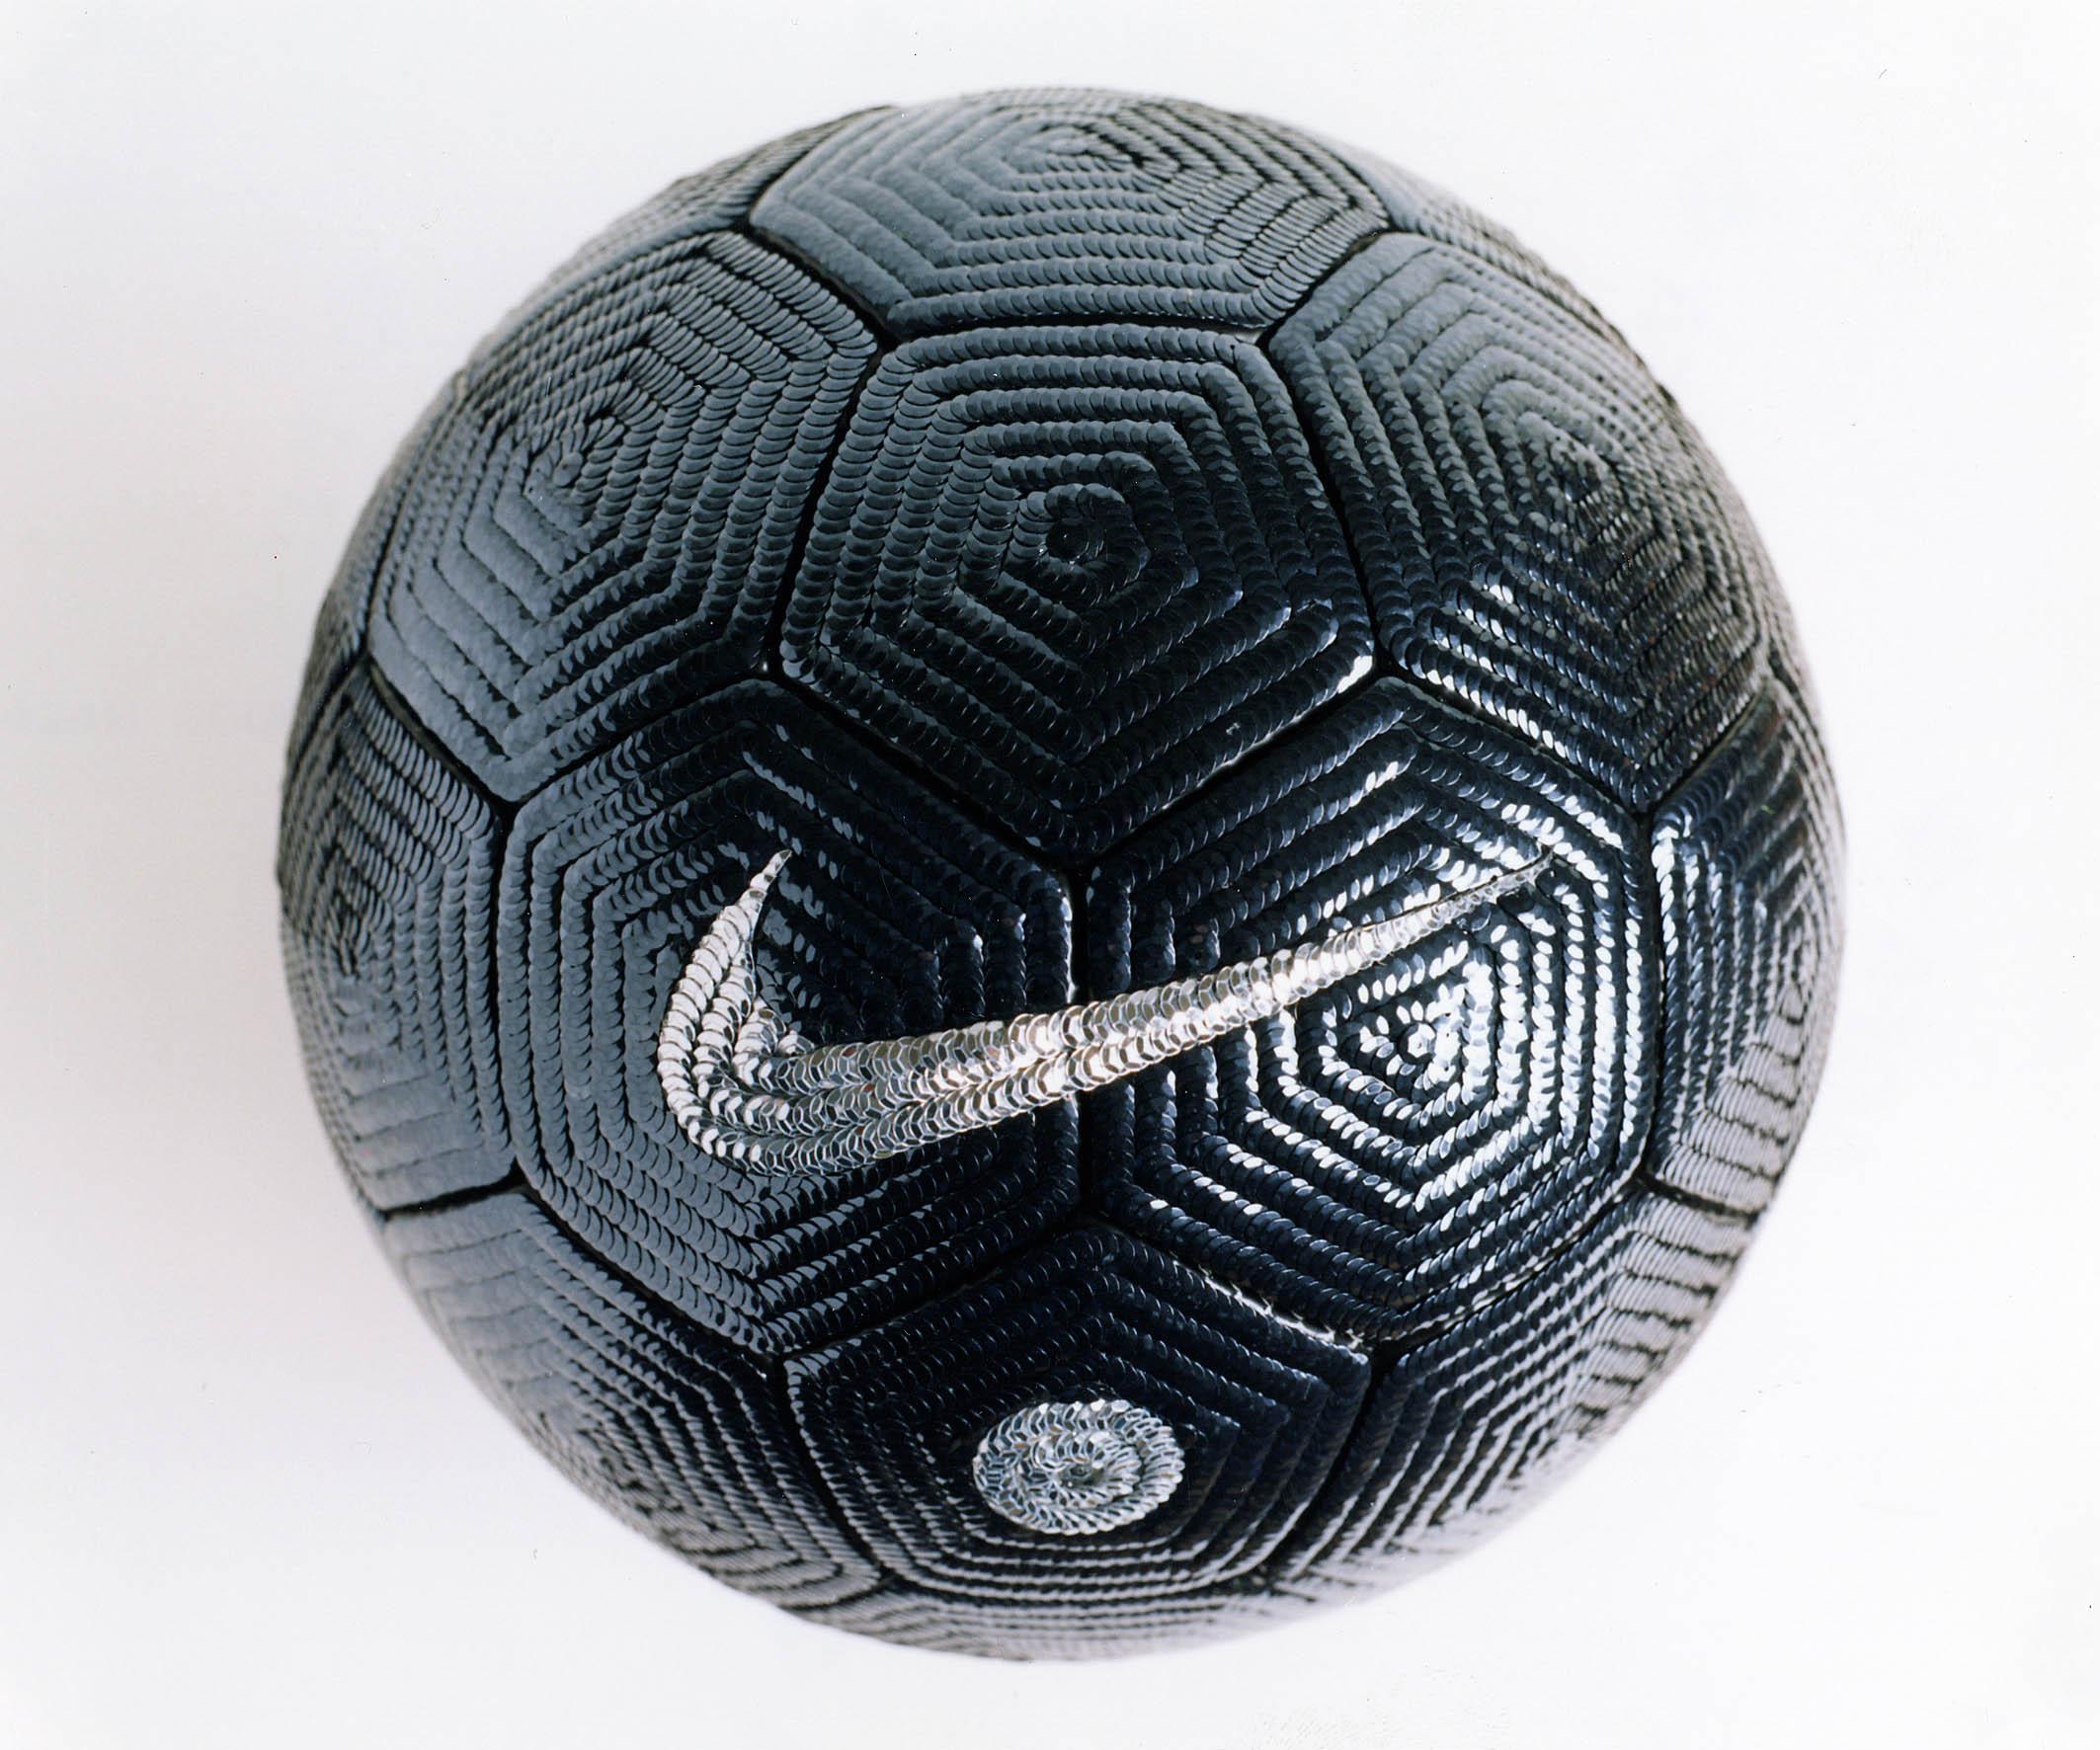 black_football.jpg